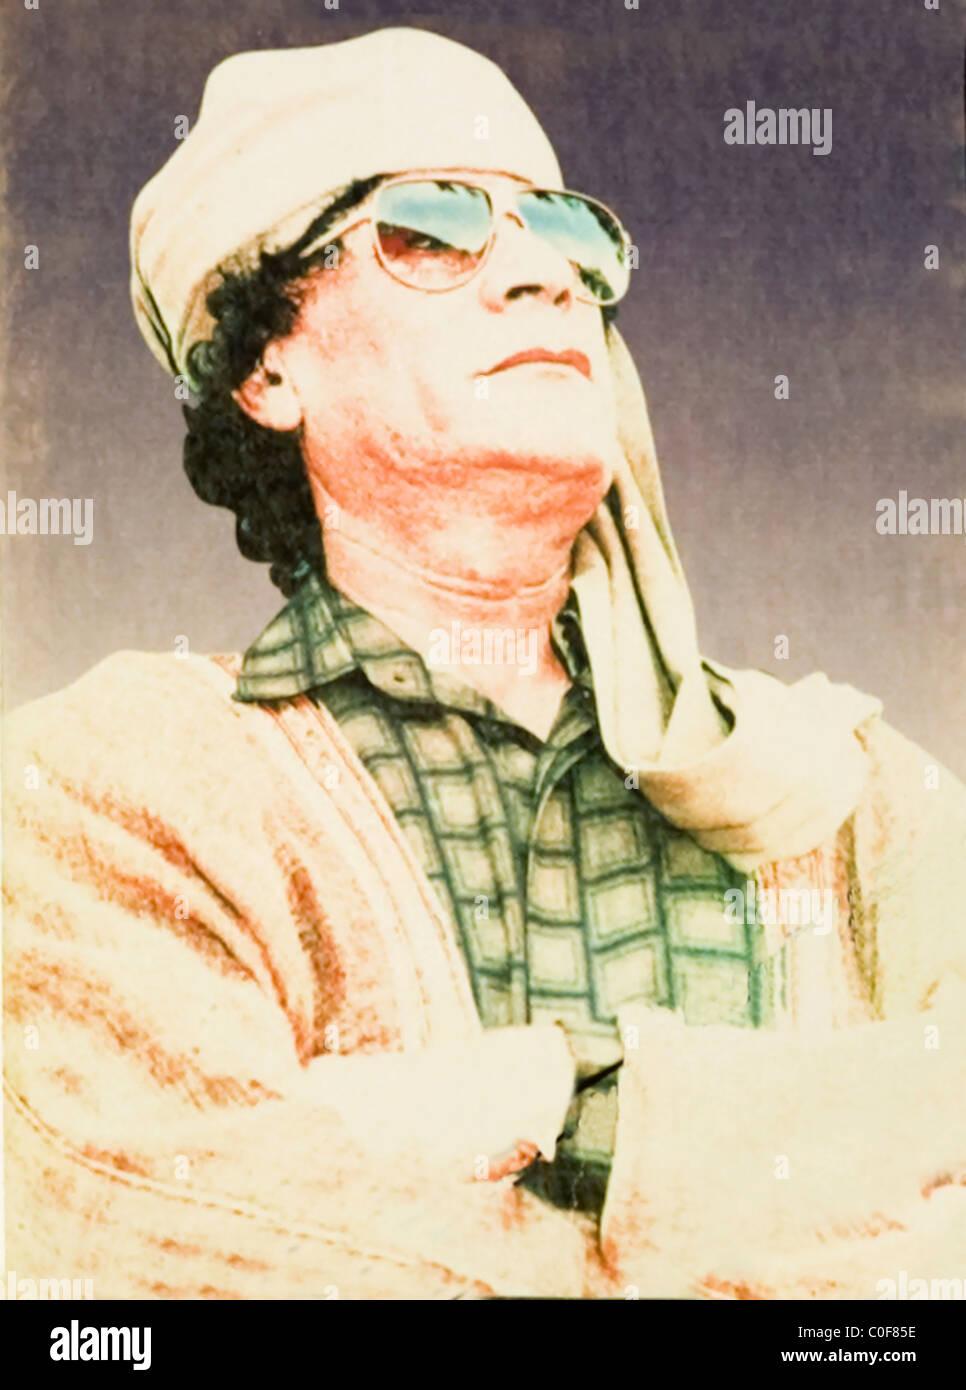 Libyan leader Colonel Gaddafi - Stock Image